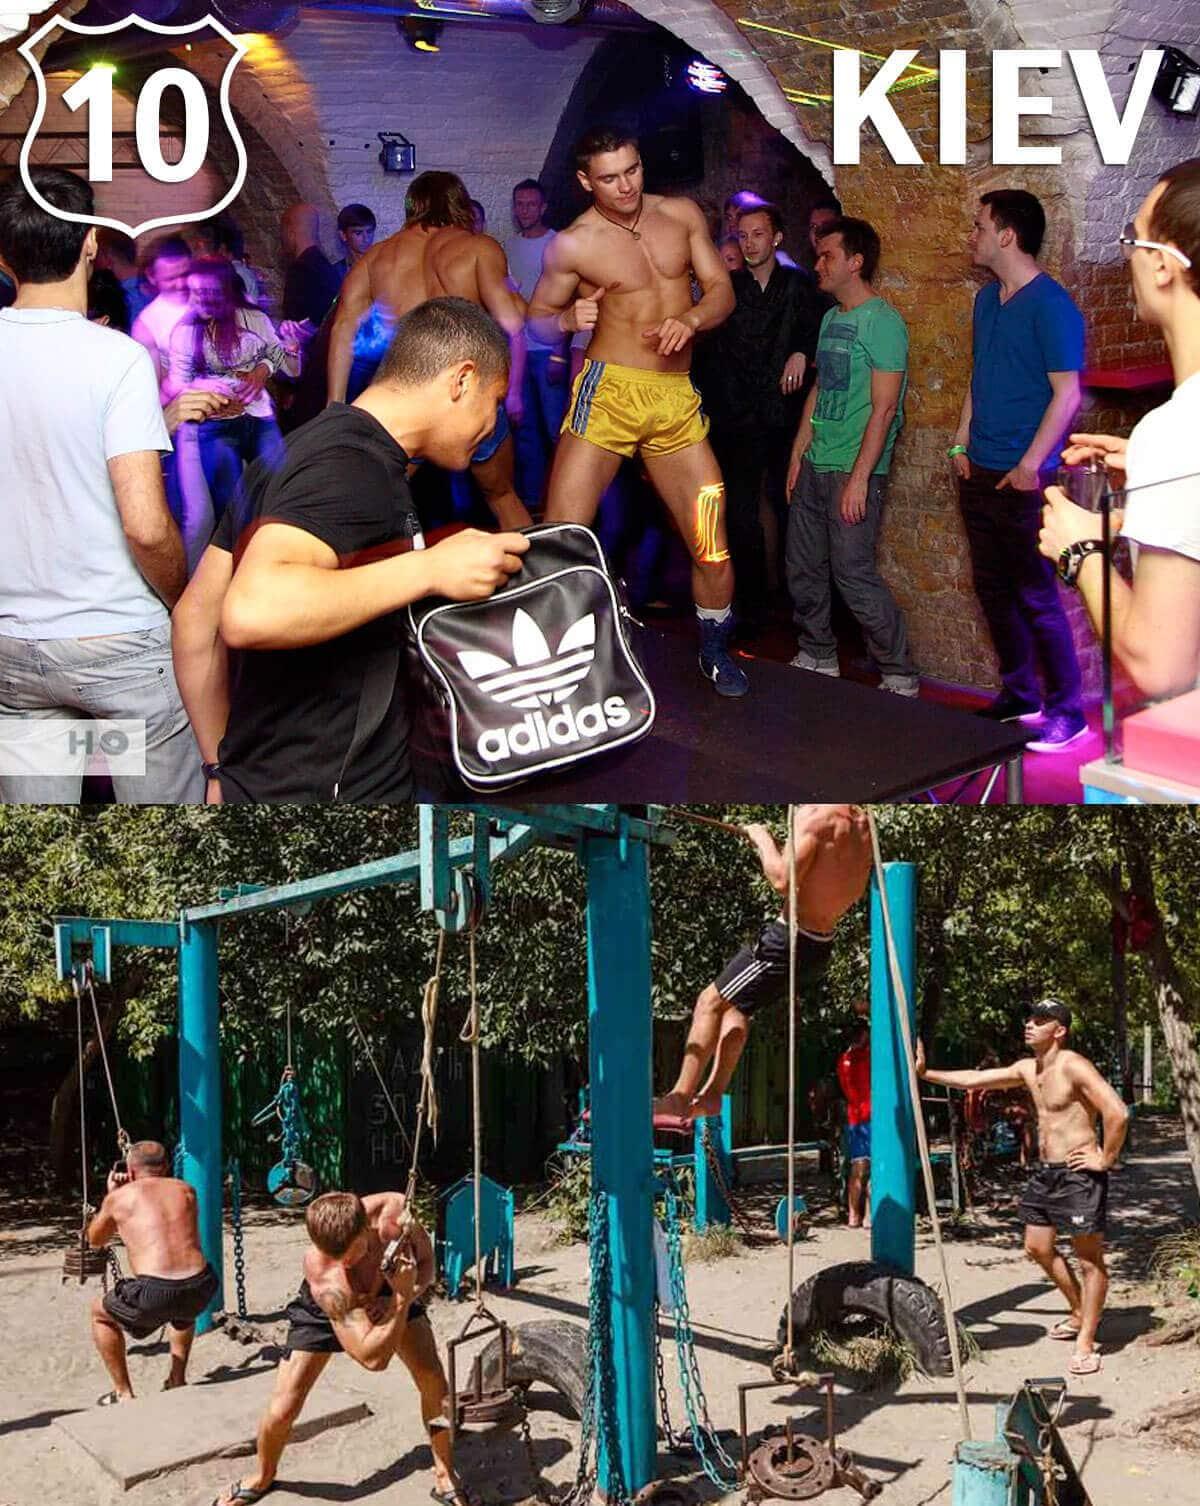 Top 10 Gay Destinations 2015 Kiev